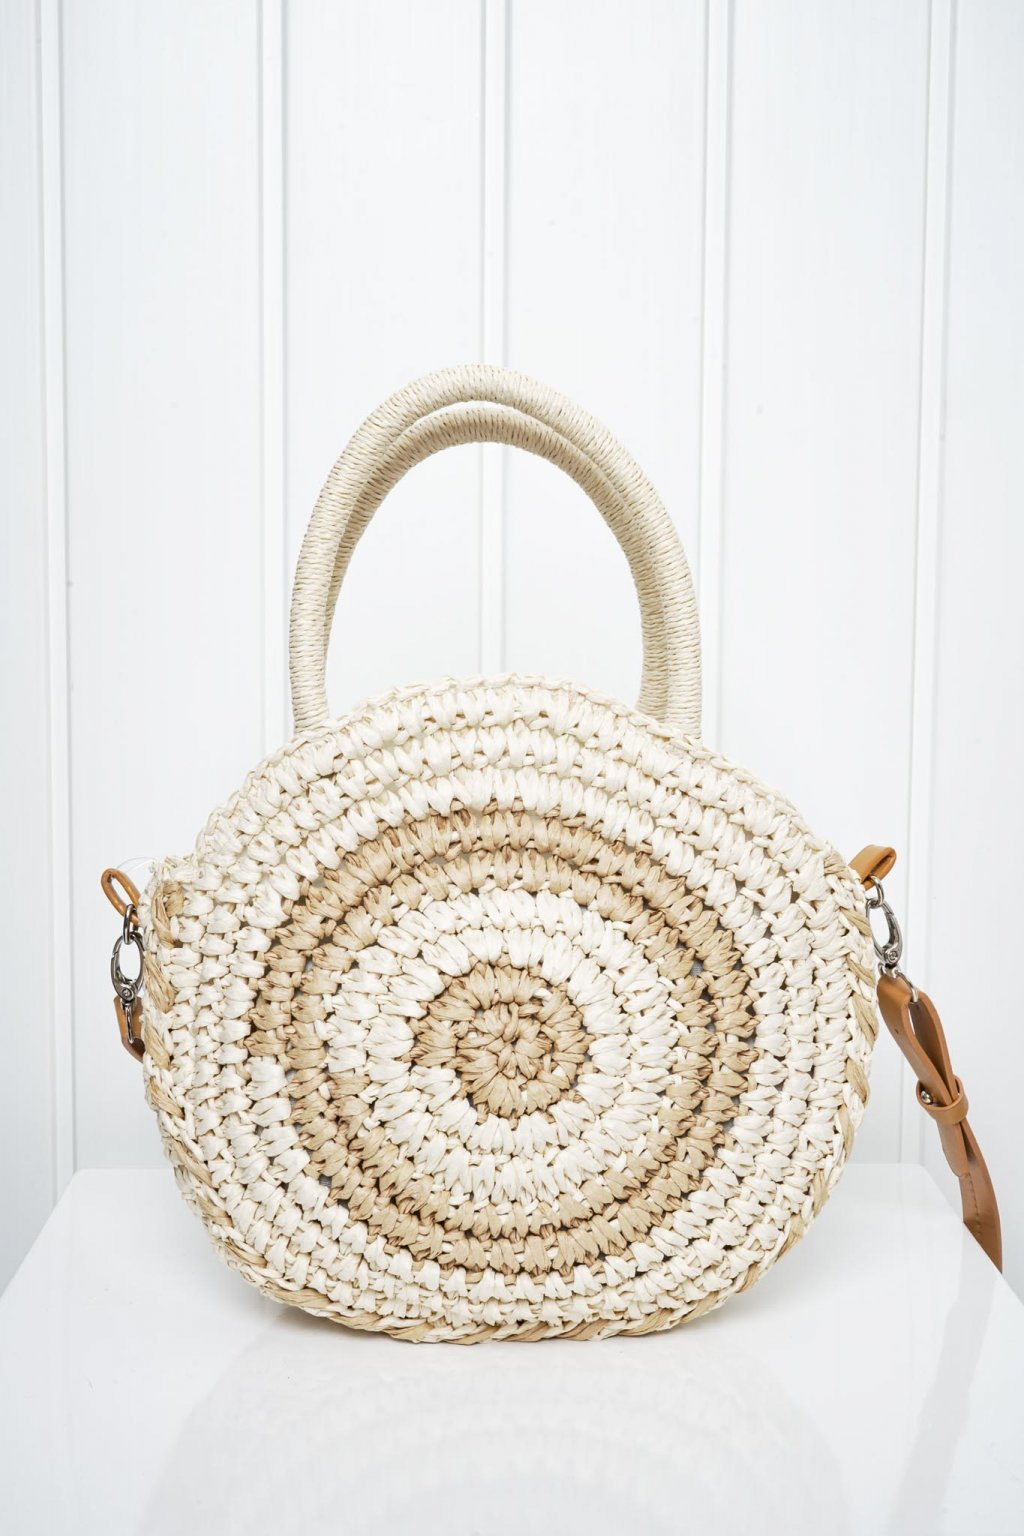 Kabelka, crossbody, ruksak, shopping bag, shopperka, 221